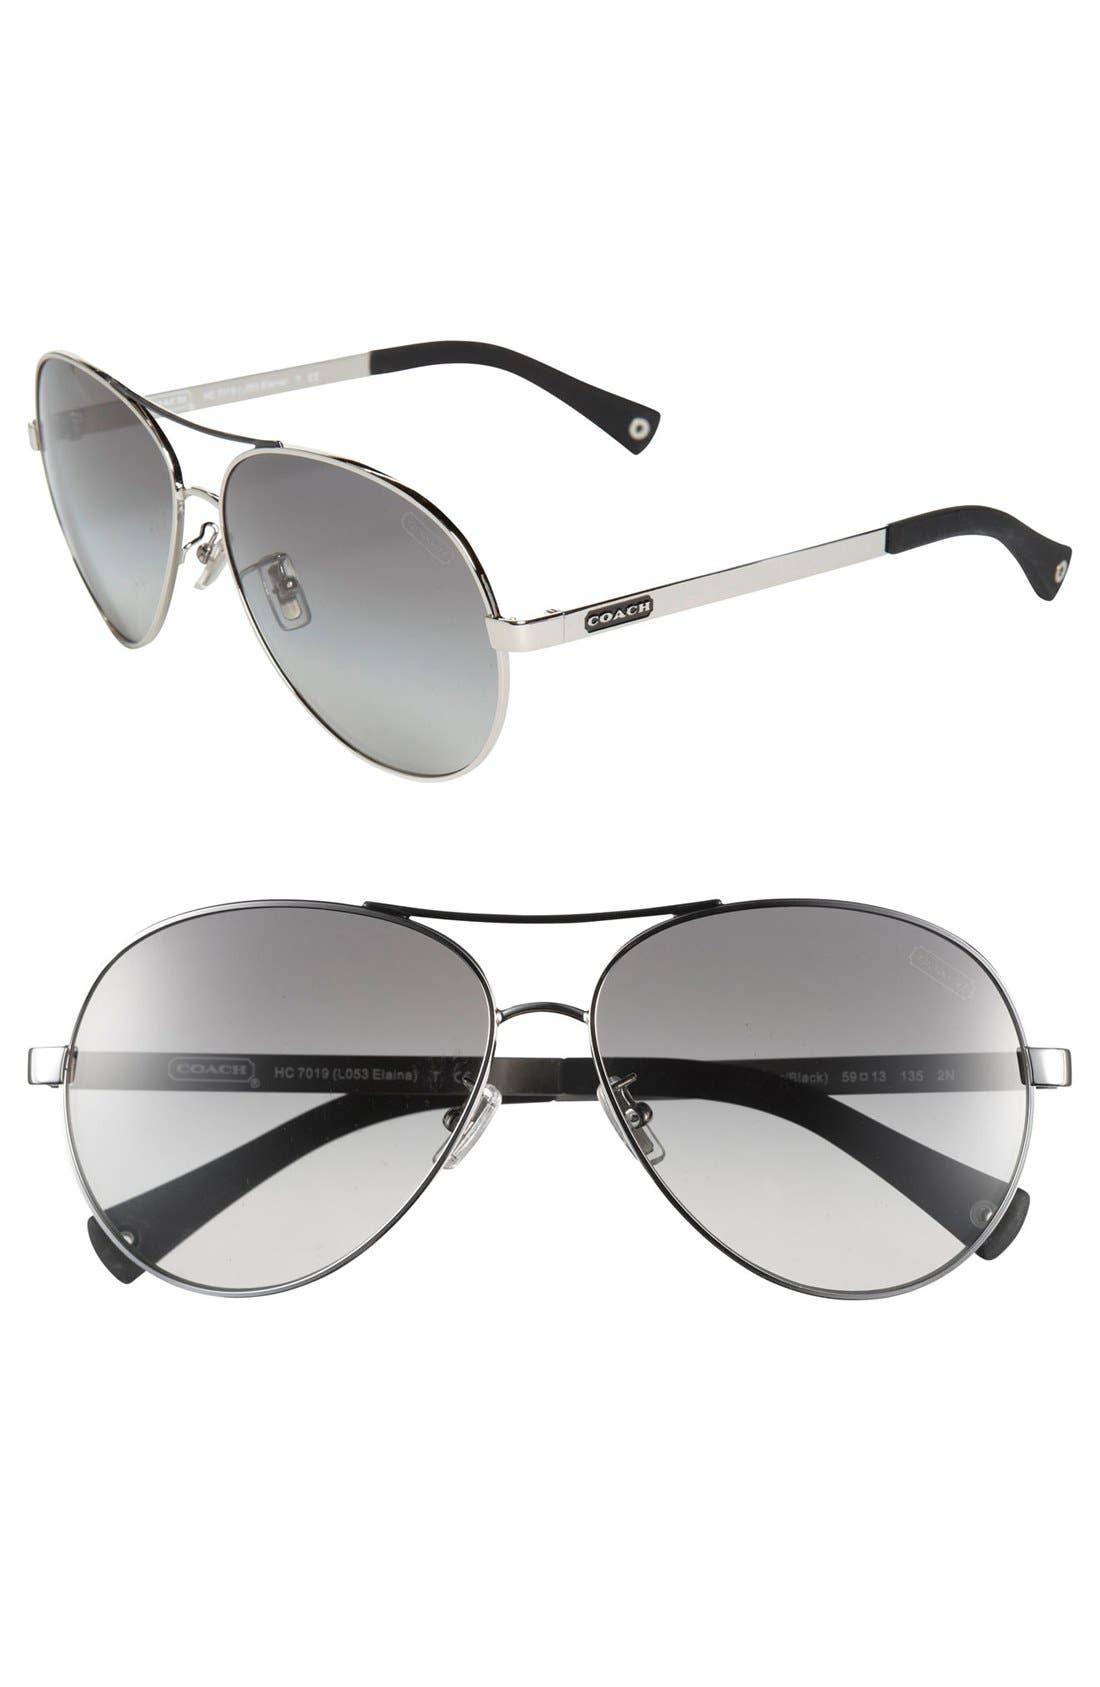 Main Image - COACH 'Elaina' 59mm Aviator Sunglasses